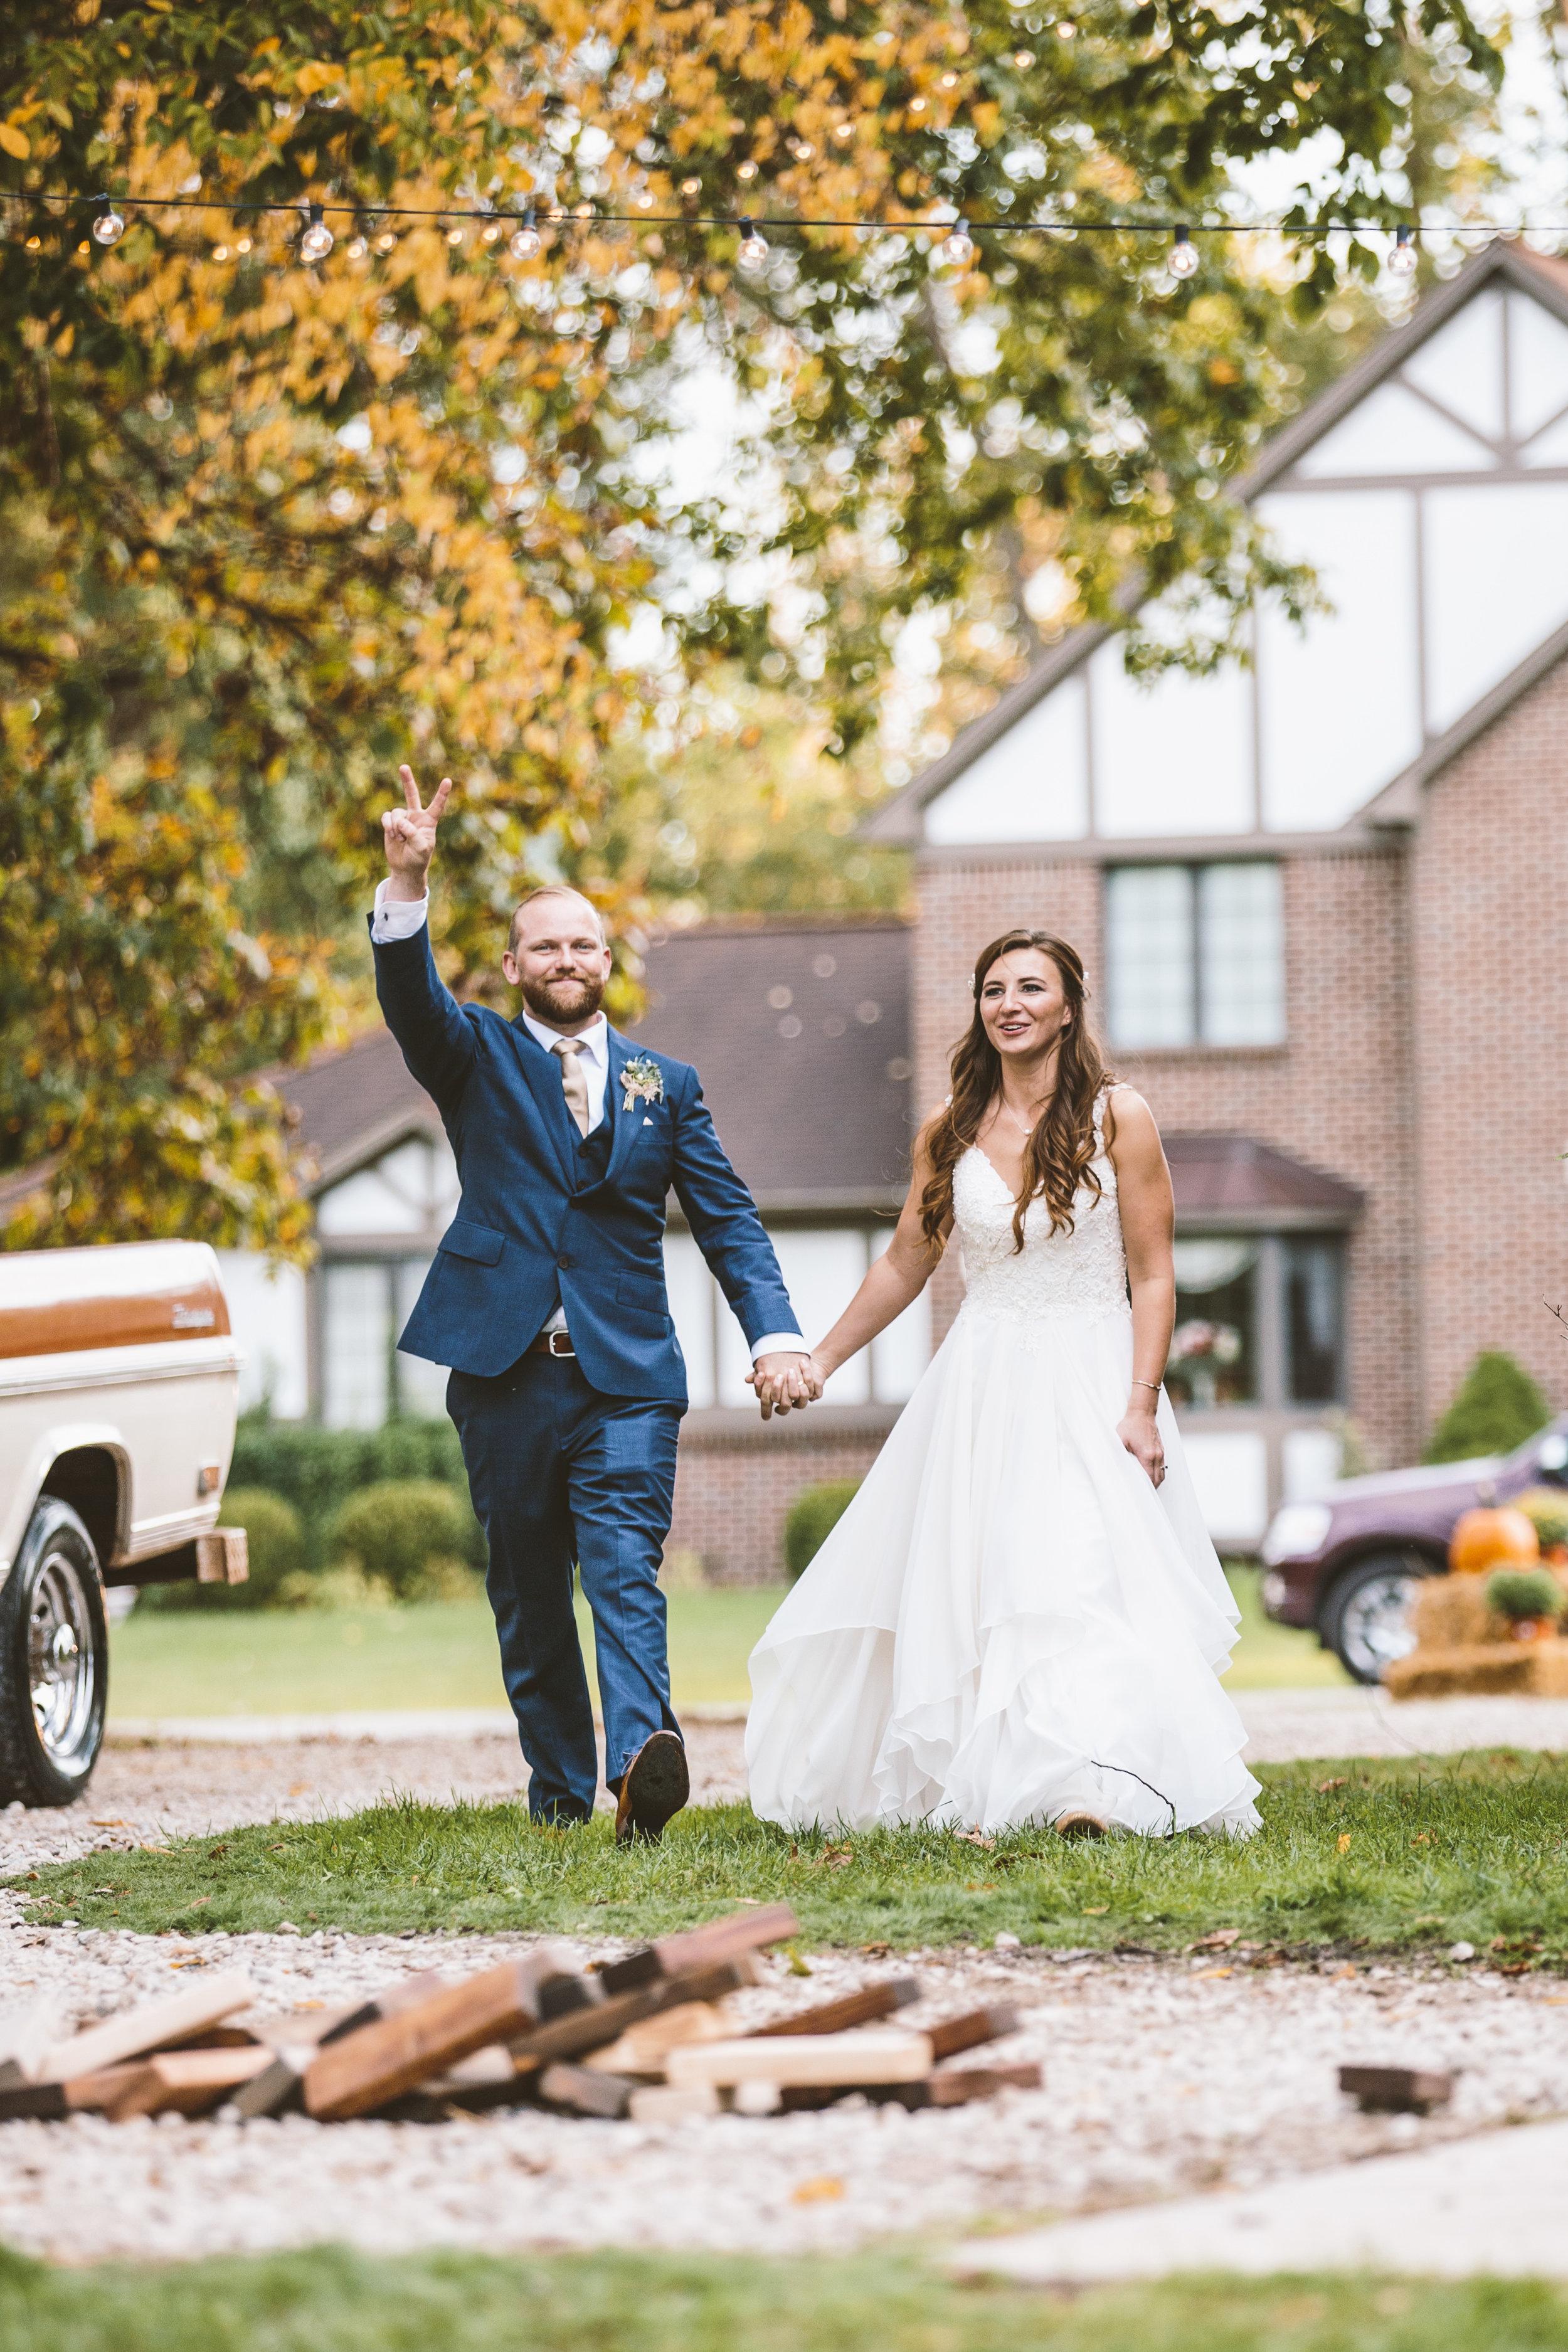 Wedding 1 (36 of 55).jpg